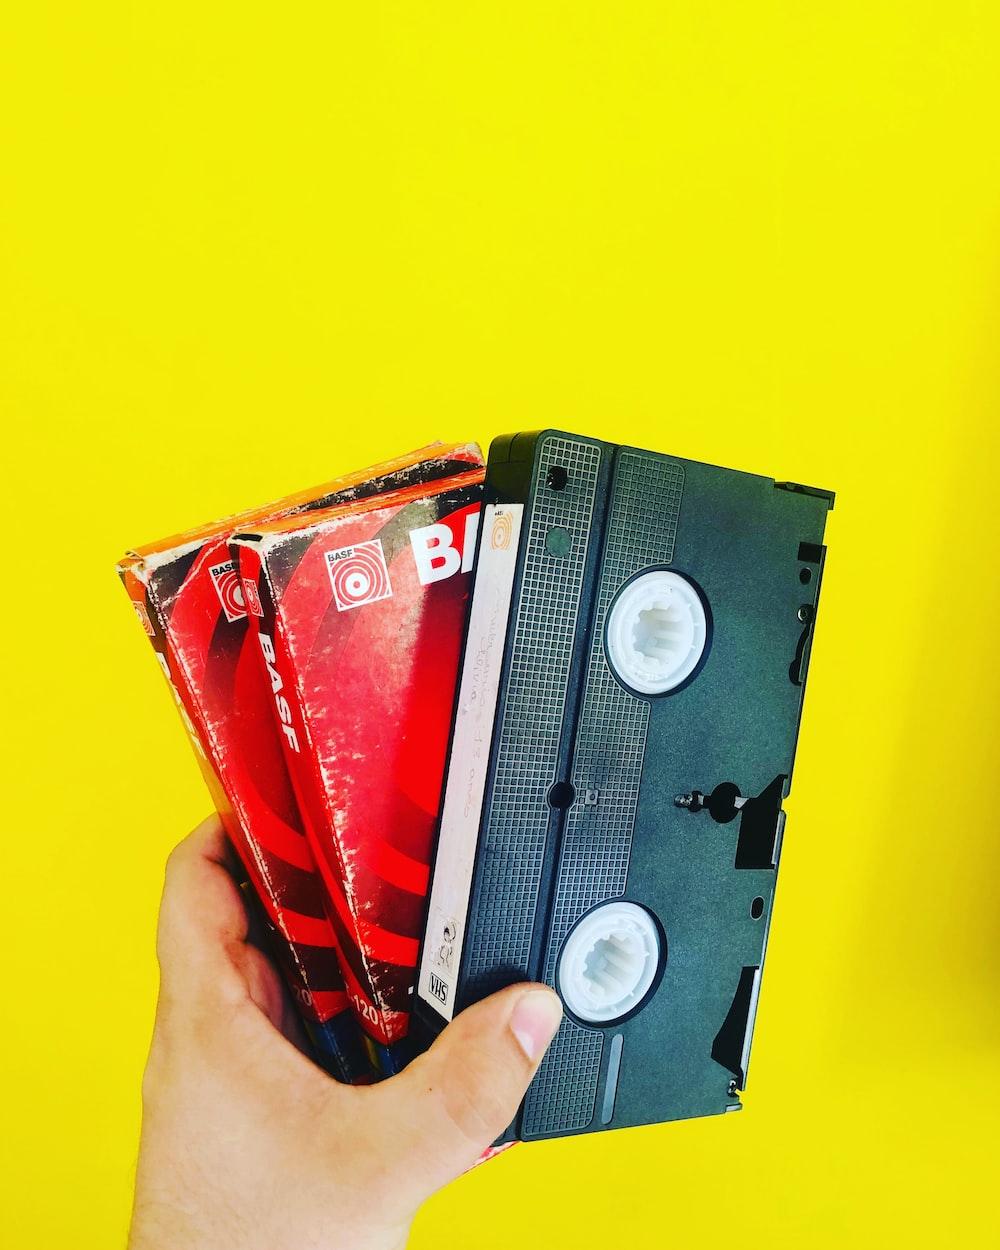 person holding black cassette